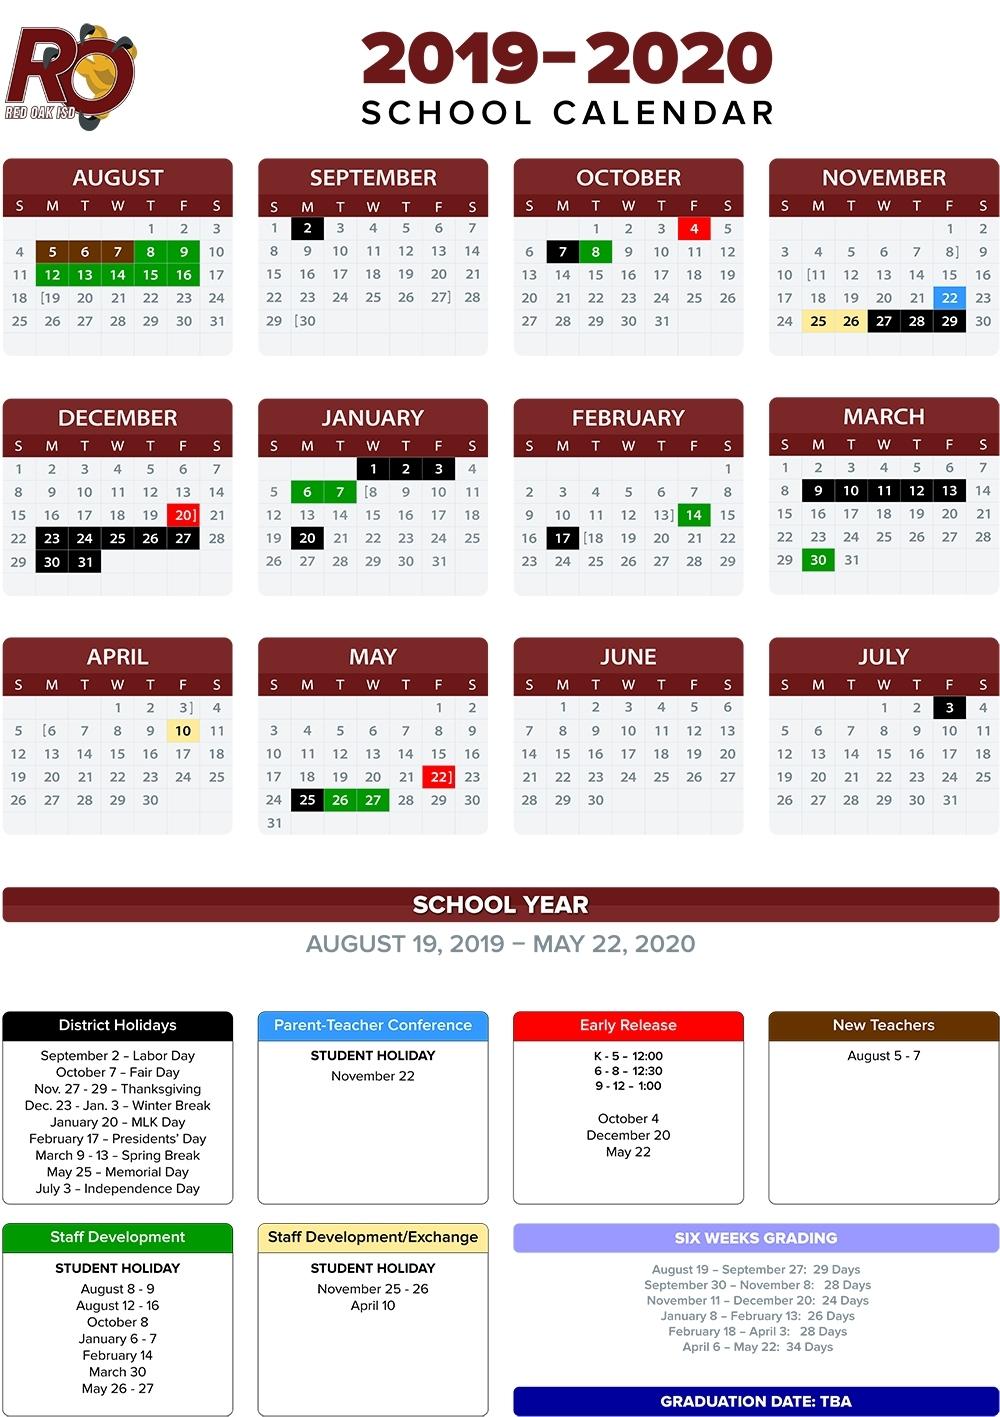 Annual School Calendar / Annual Calendar in 2019 2020 Box Calender